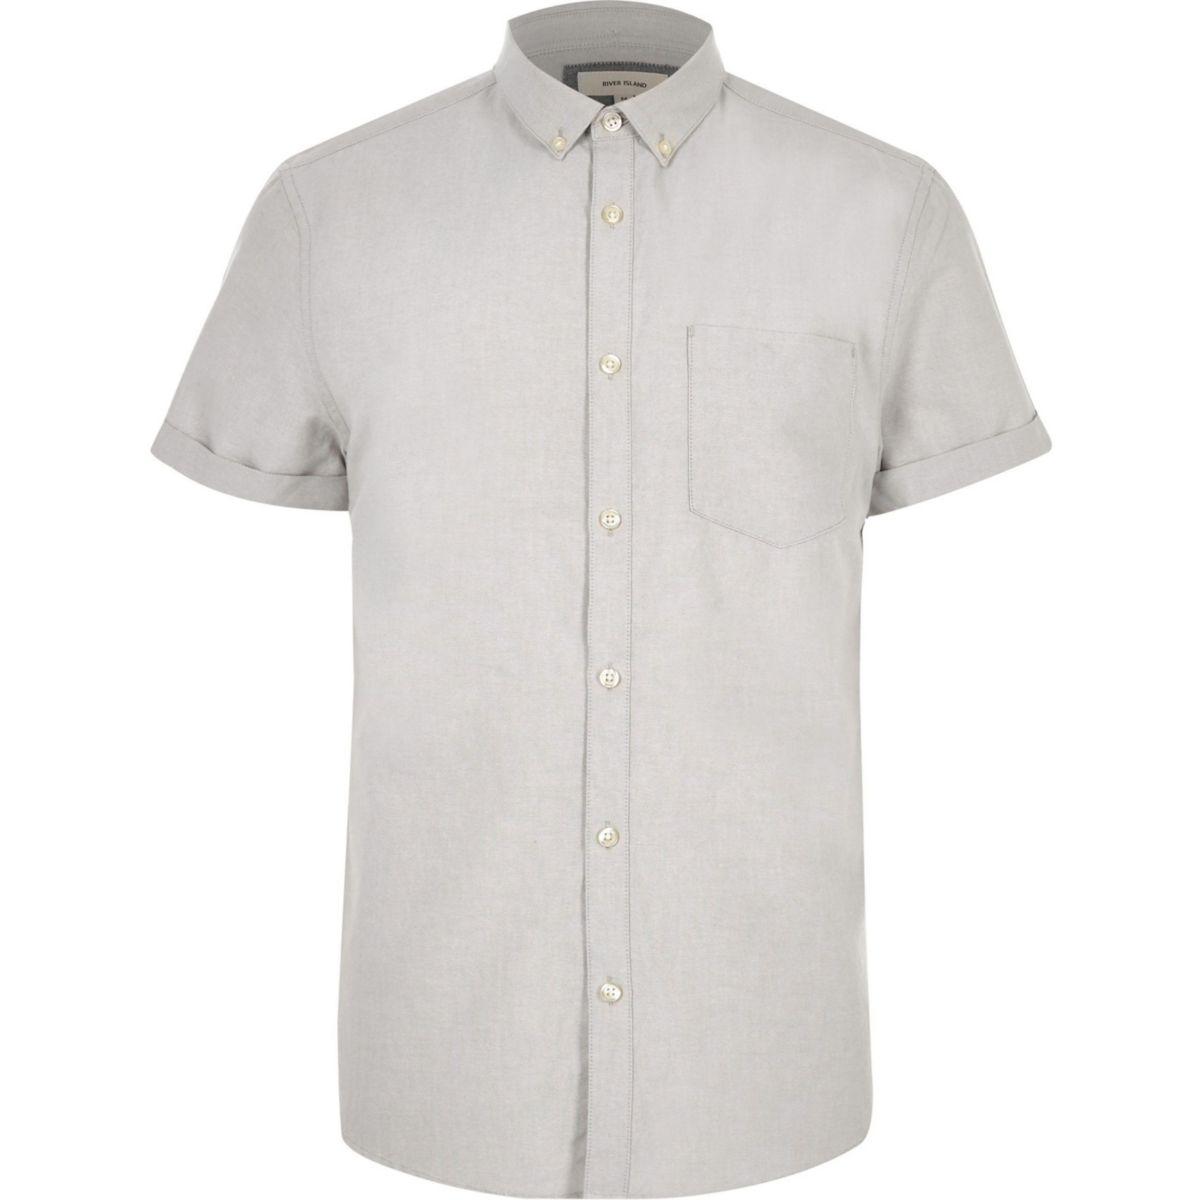 Big and Tall grey short sleeve Oxford shirt